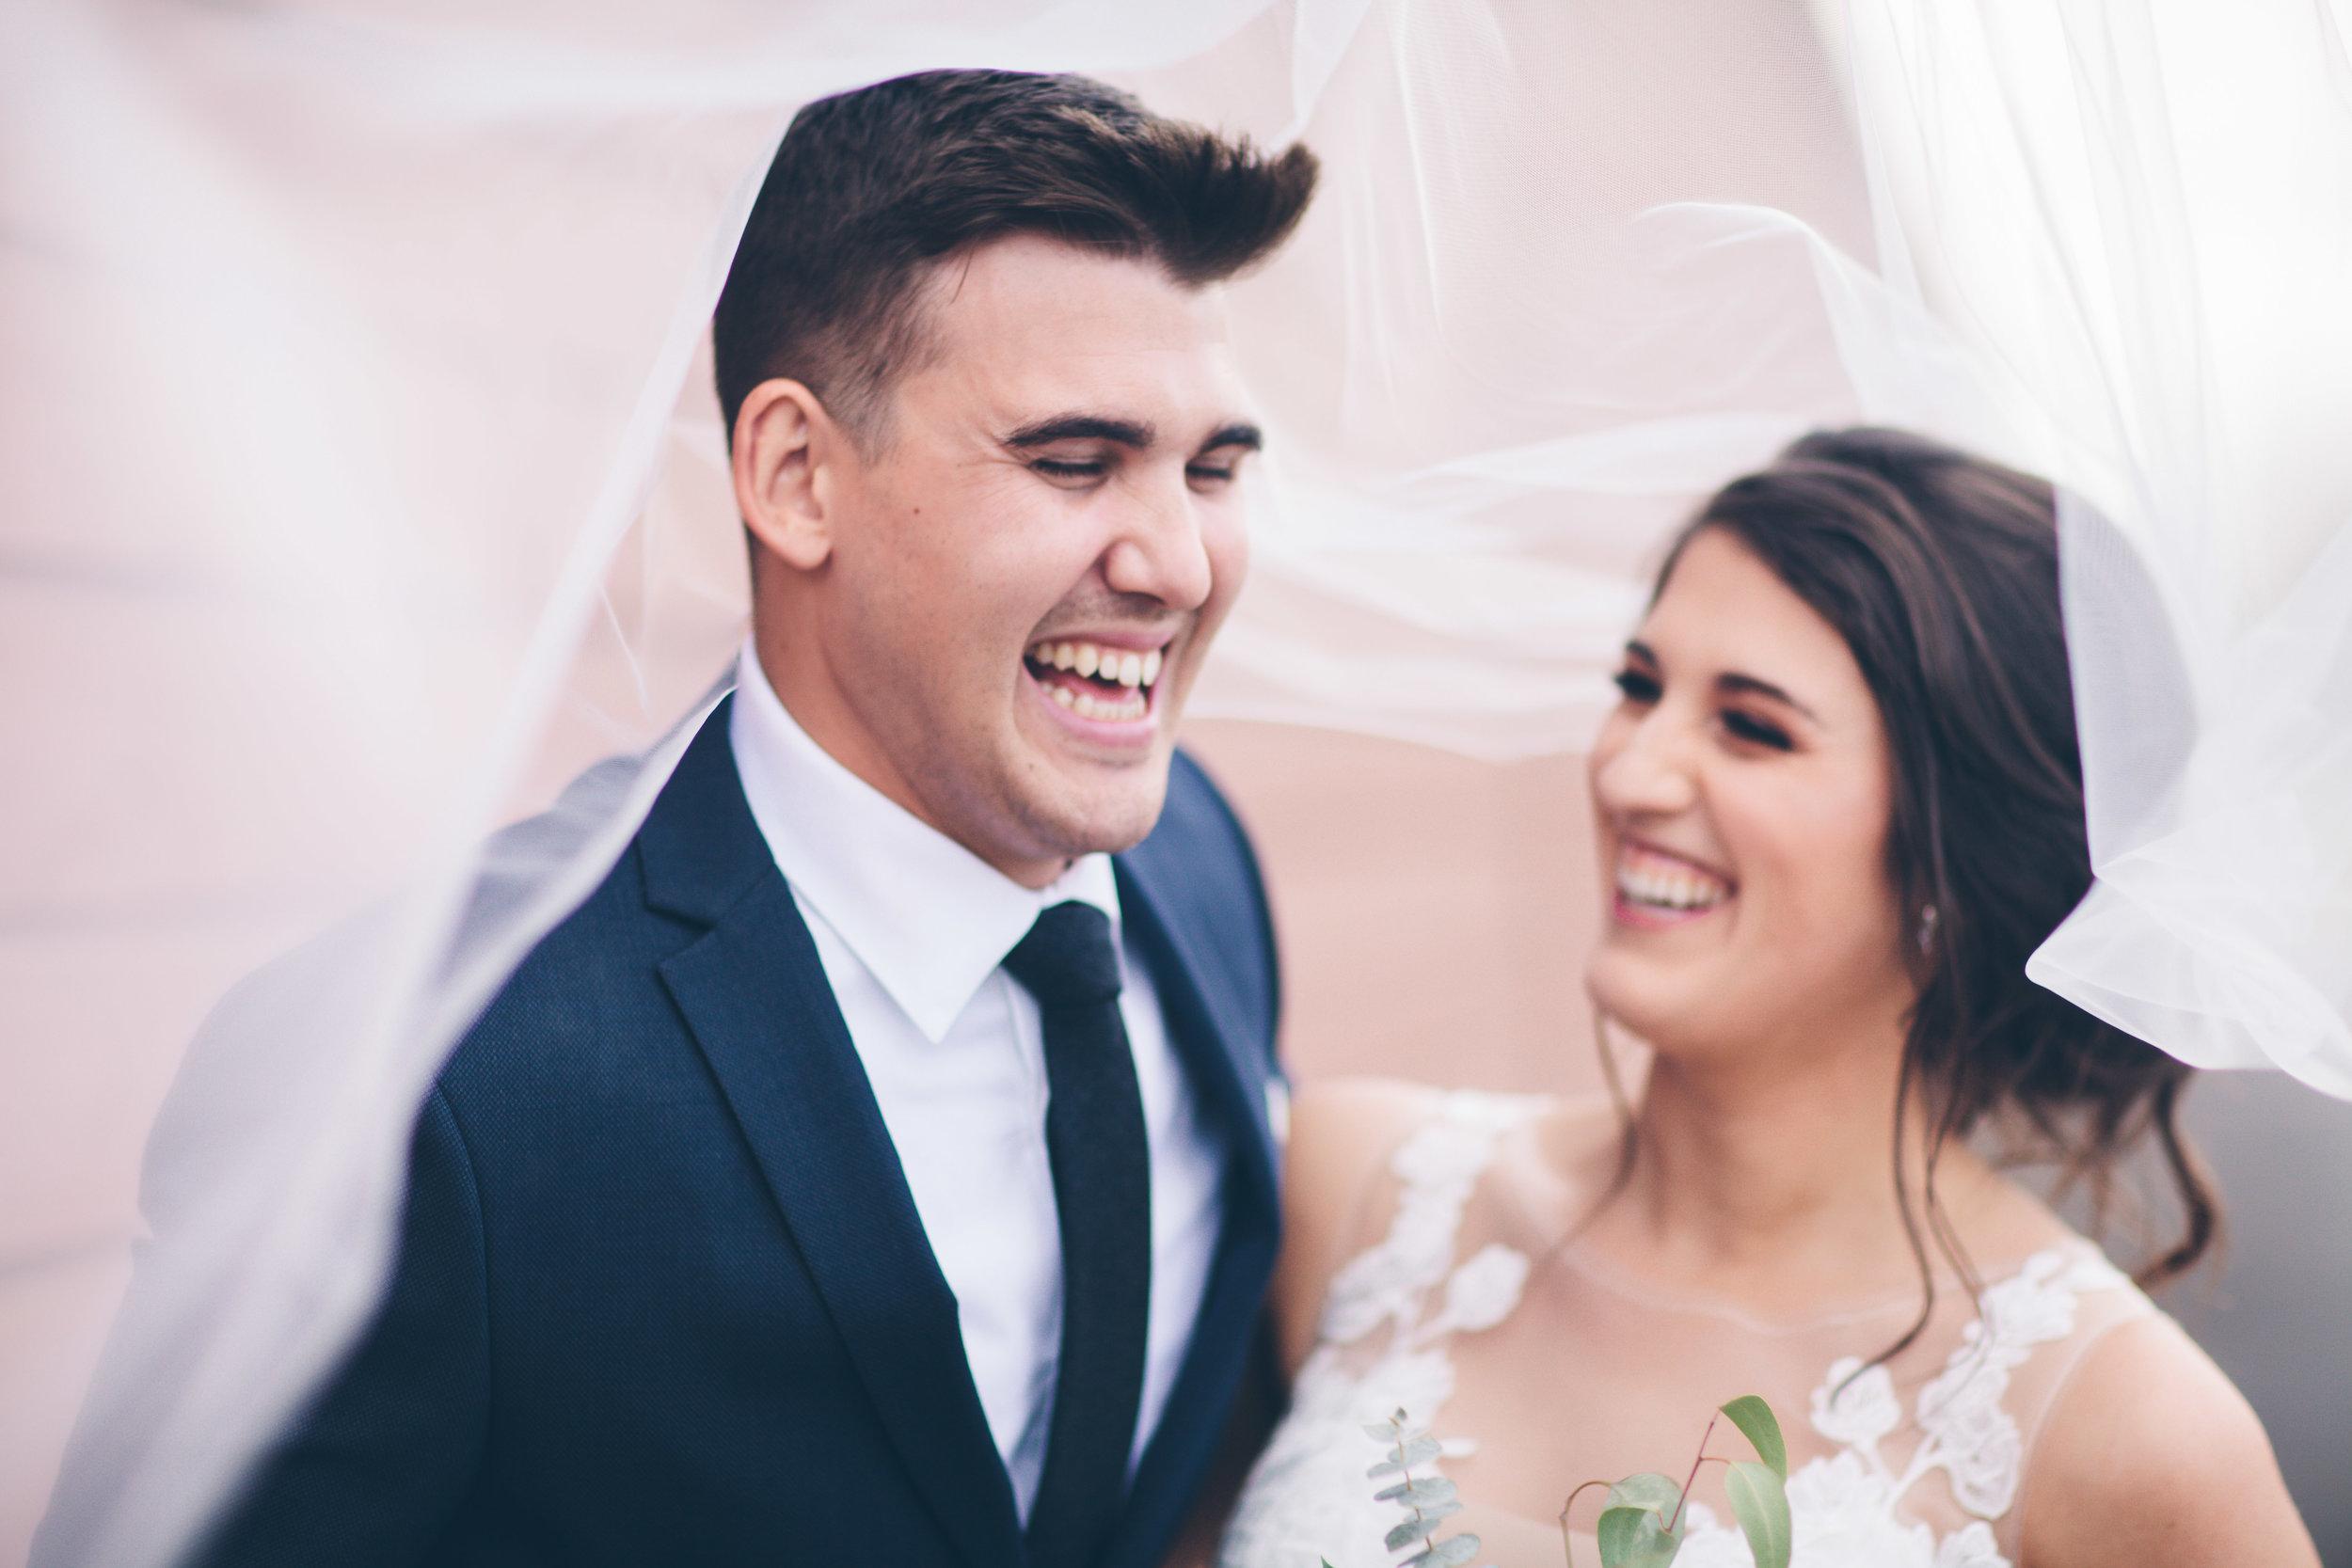 real bride wedding spokane dress veil